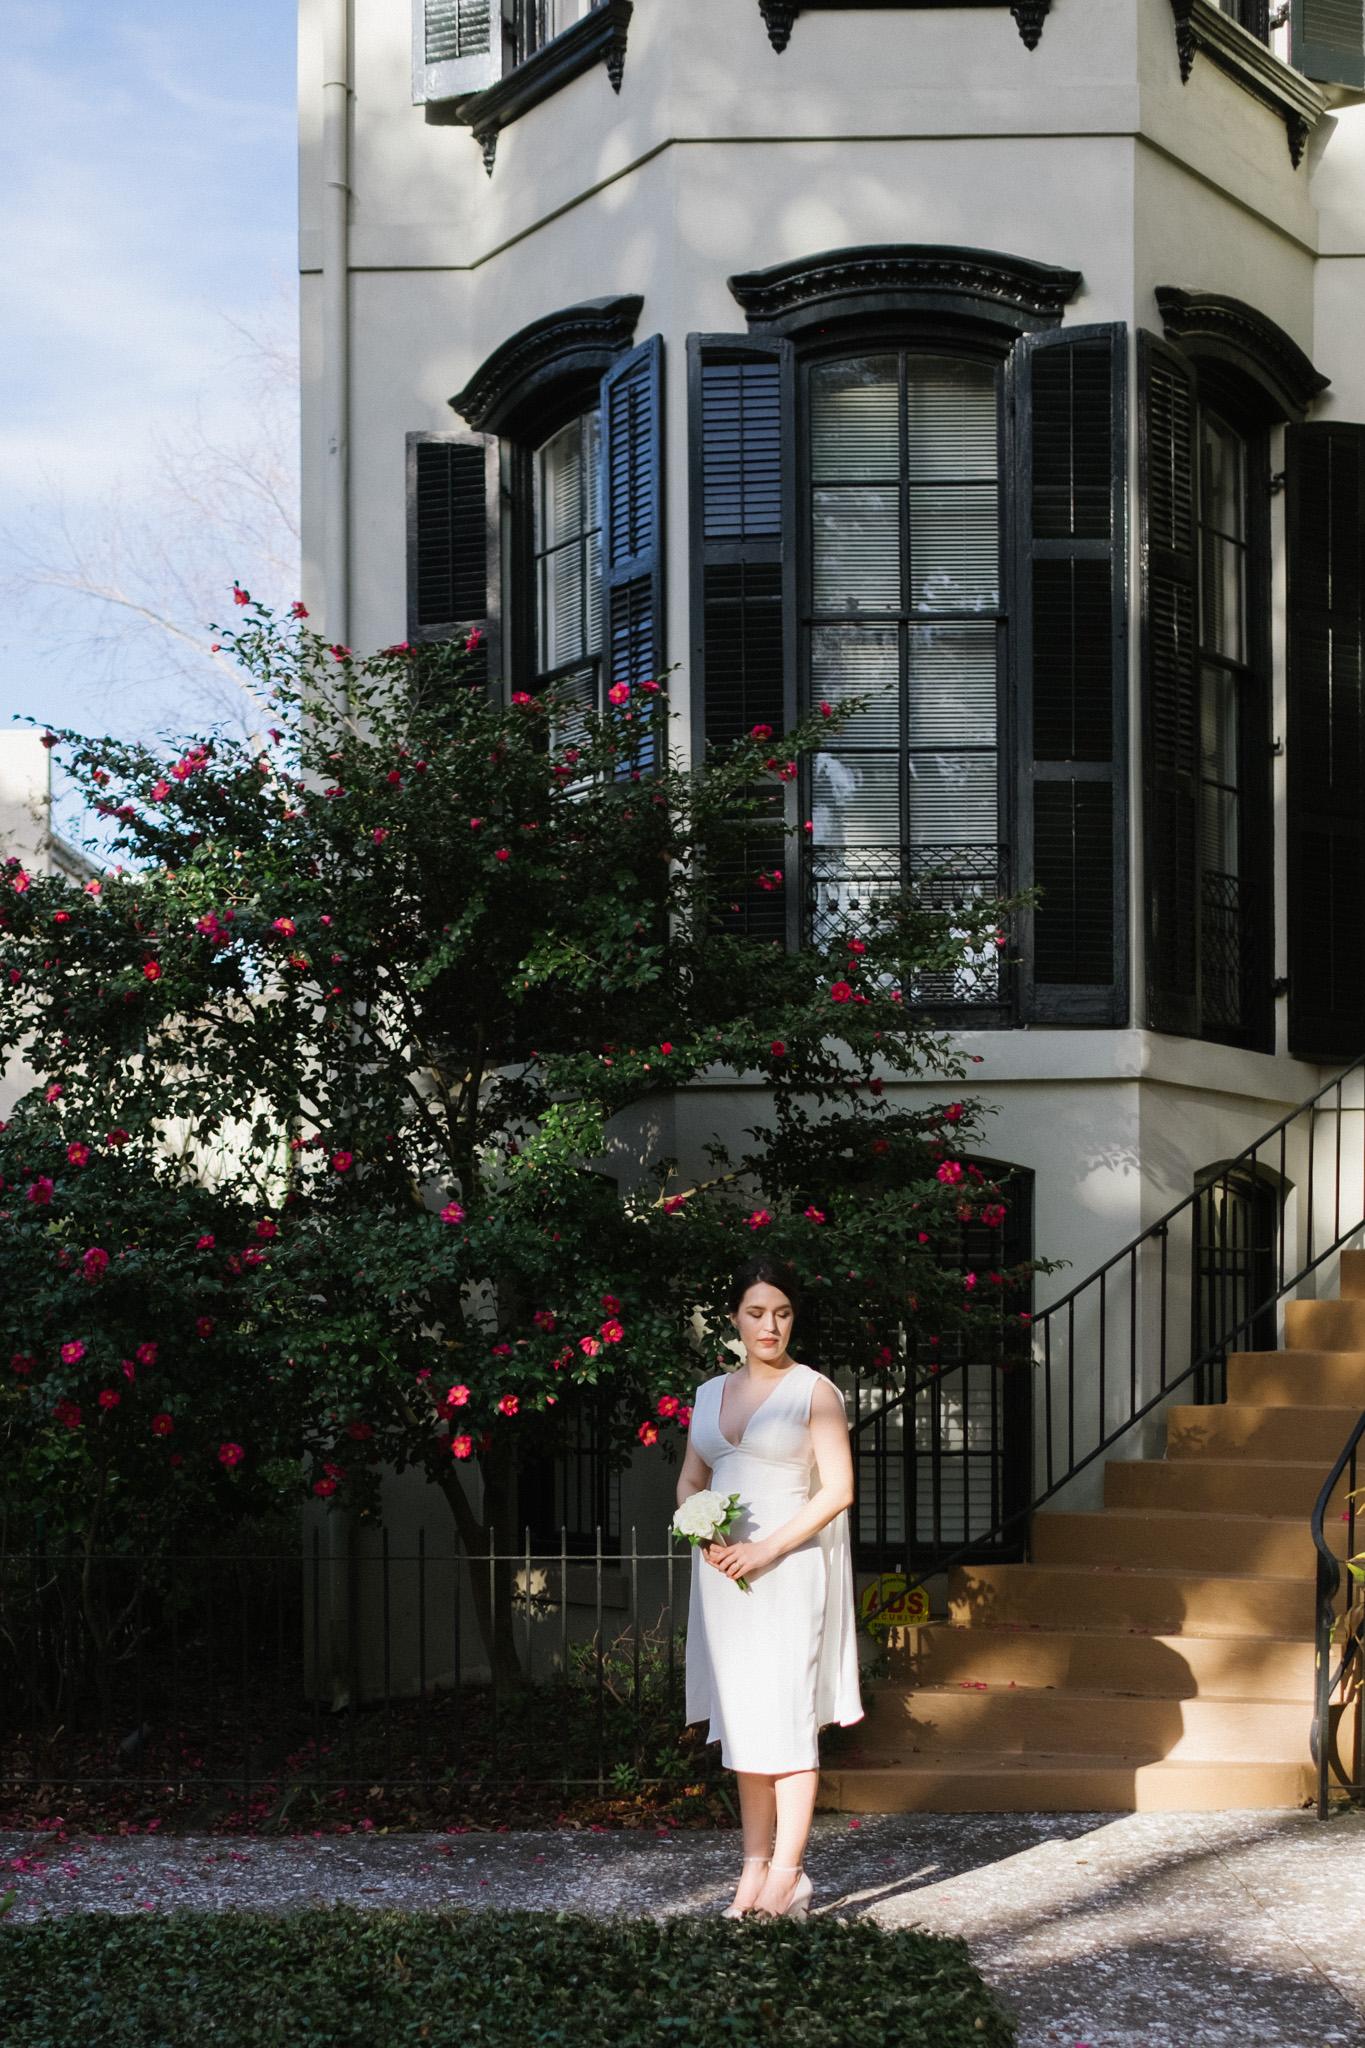 Jones Street Wedding   Concept-A Photography